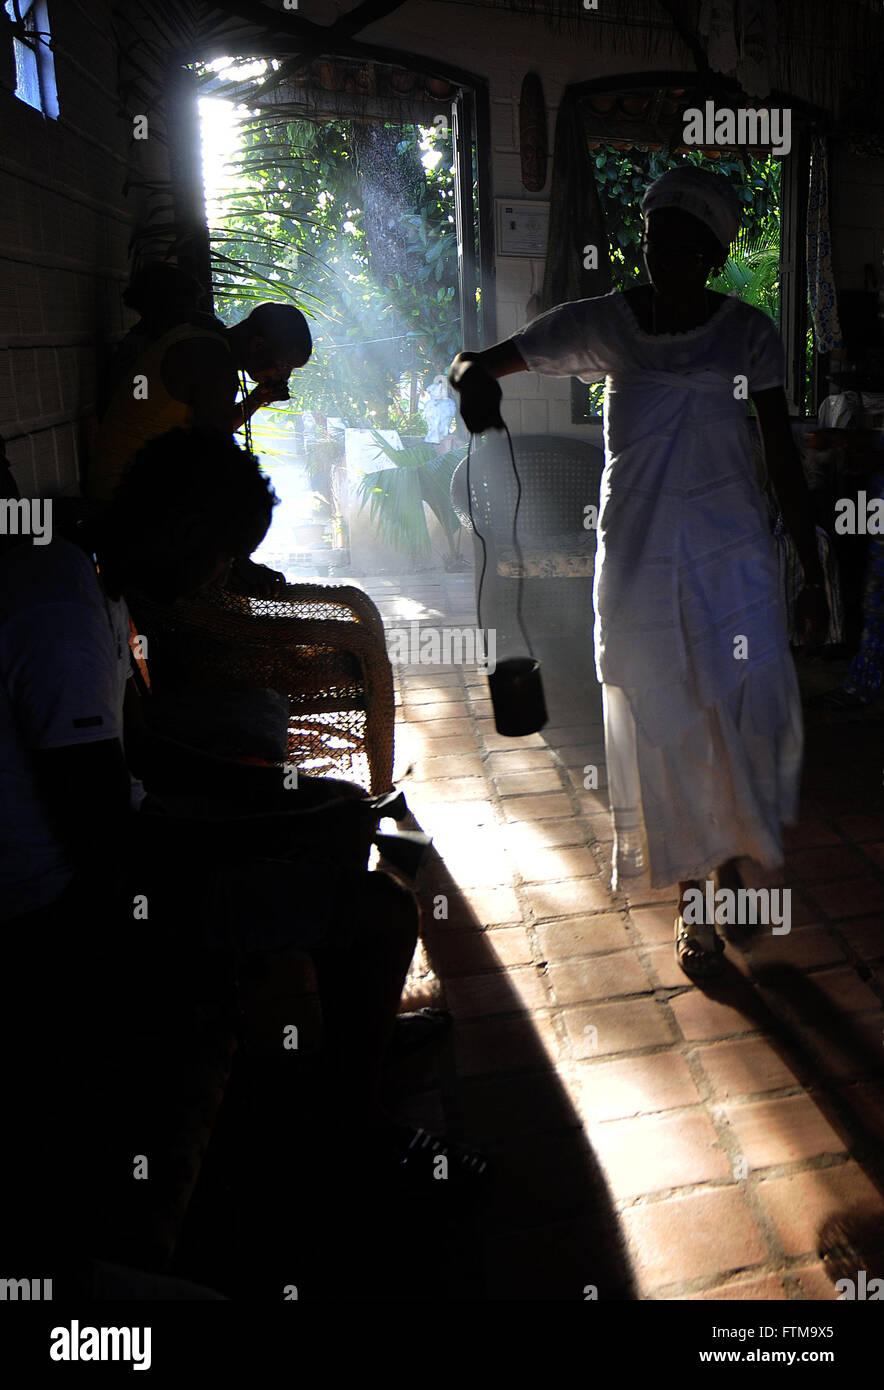 Ax cantiere Ile Ala Obatalande - Candomble Ketu nazione Immagini Stock